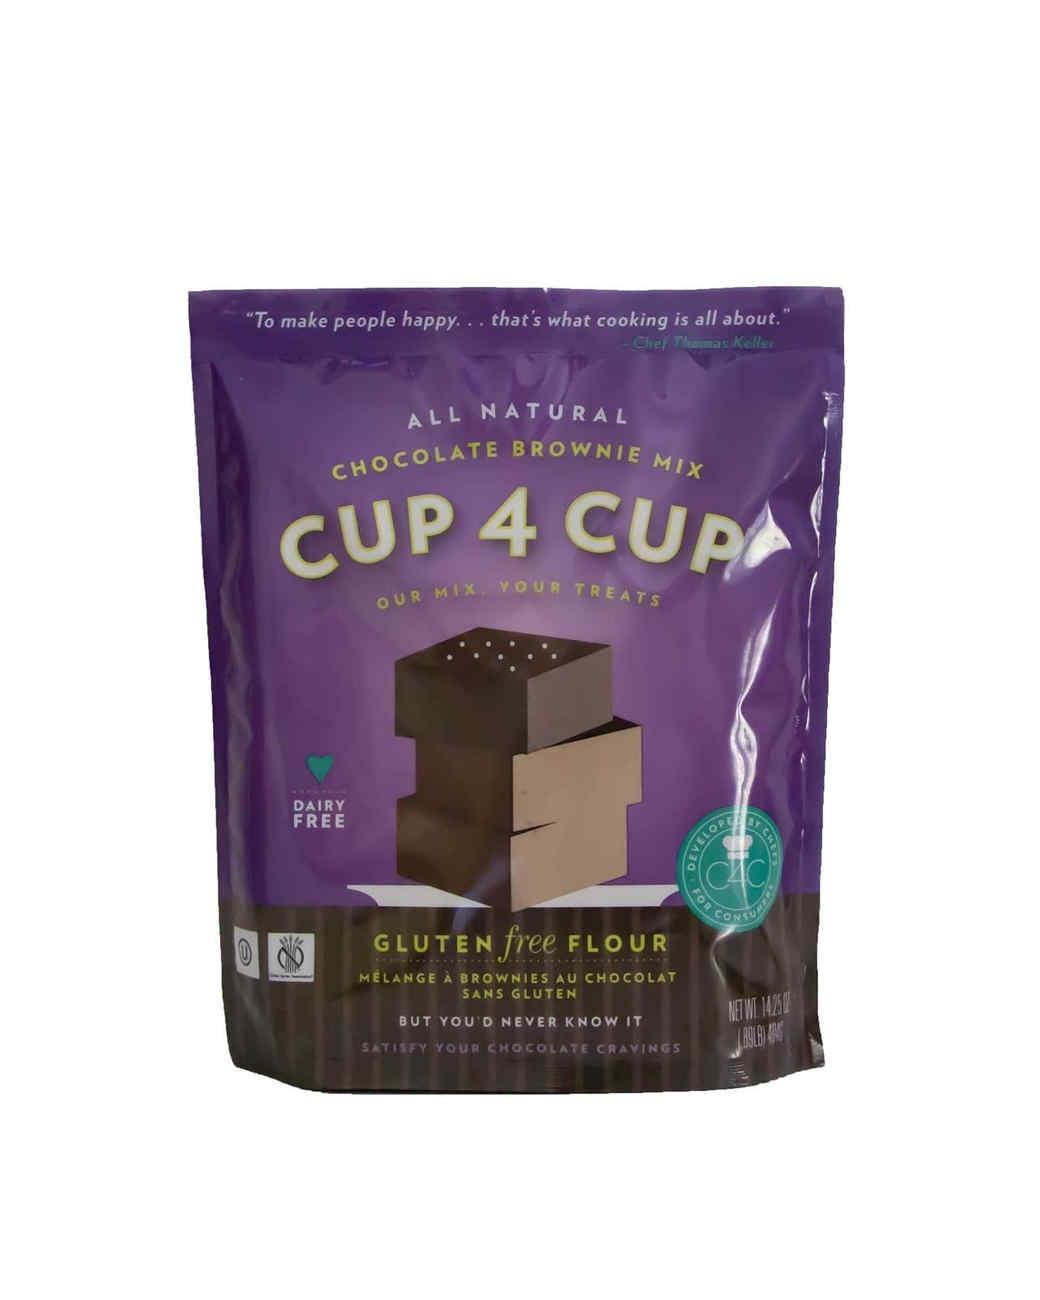 cup-4-cup-brownie-mix-0714.jpg